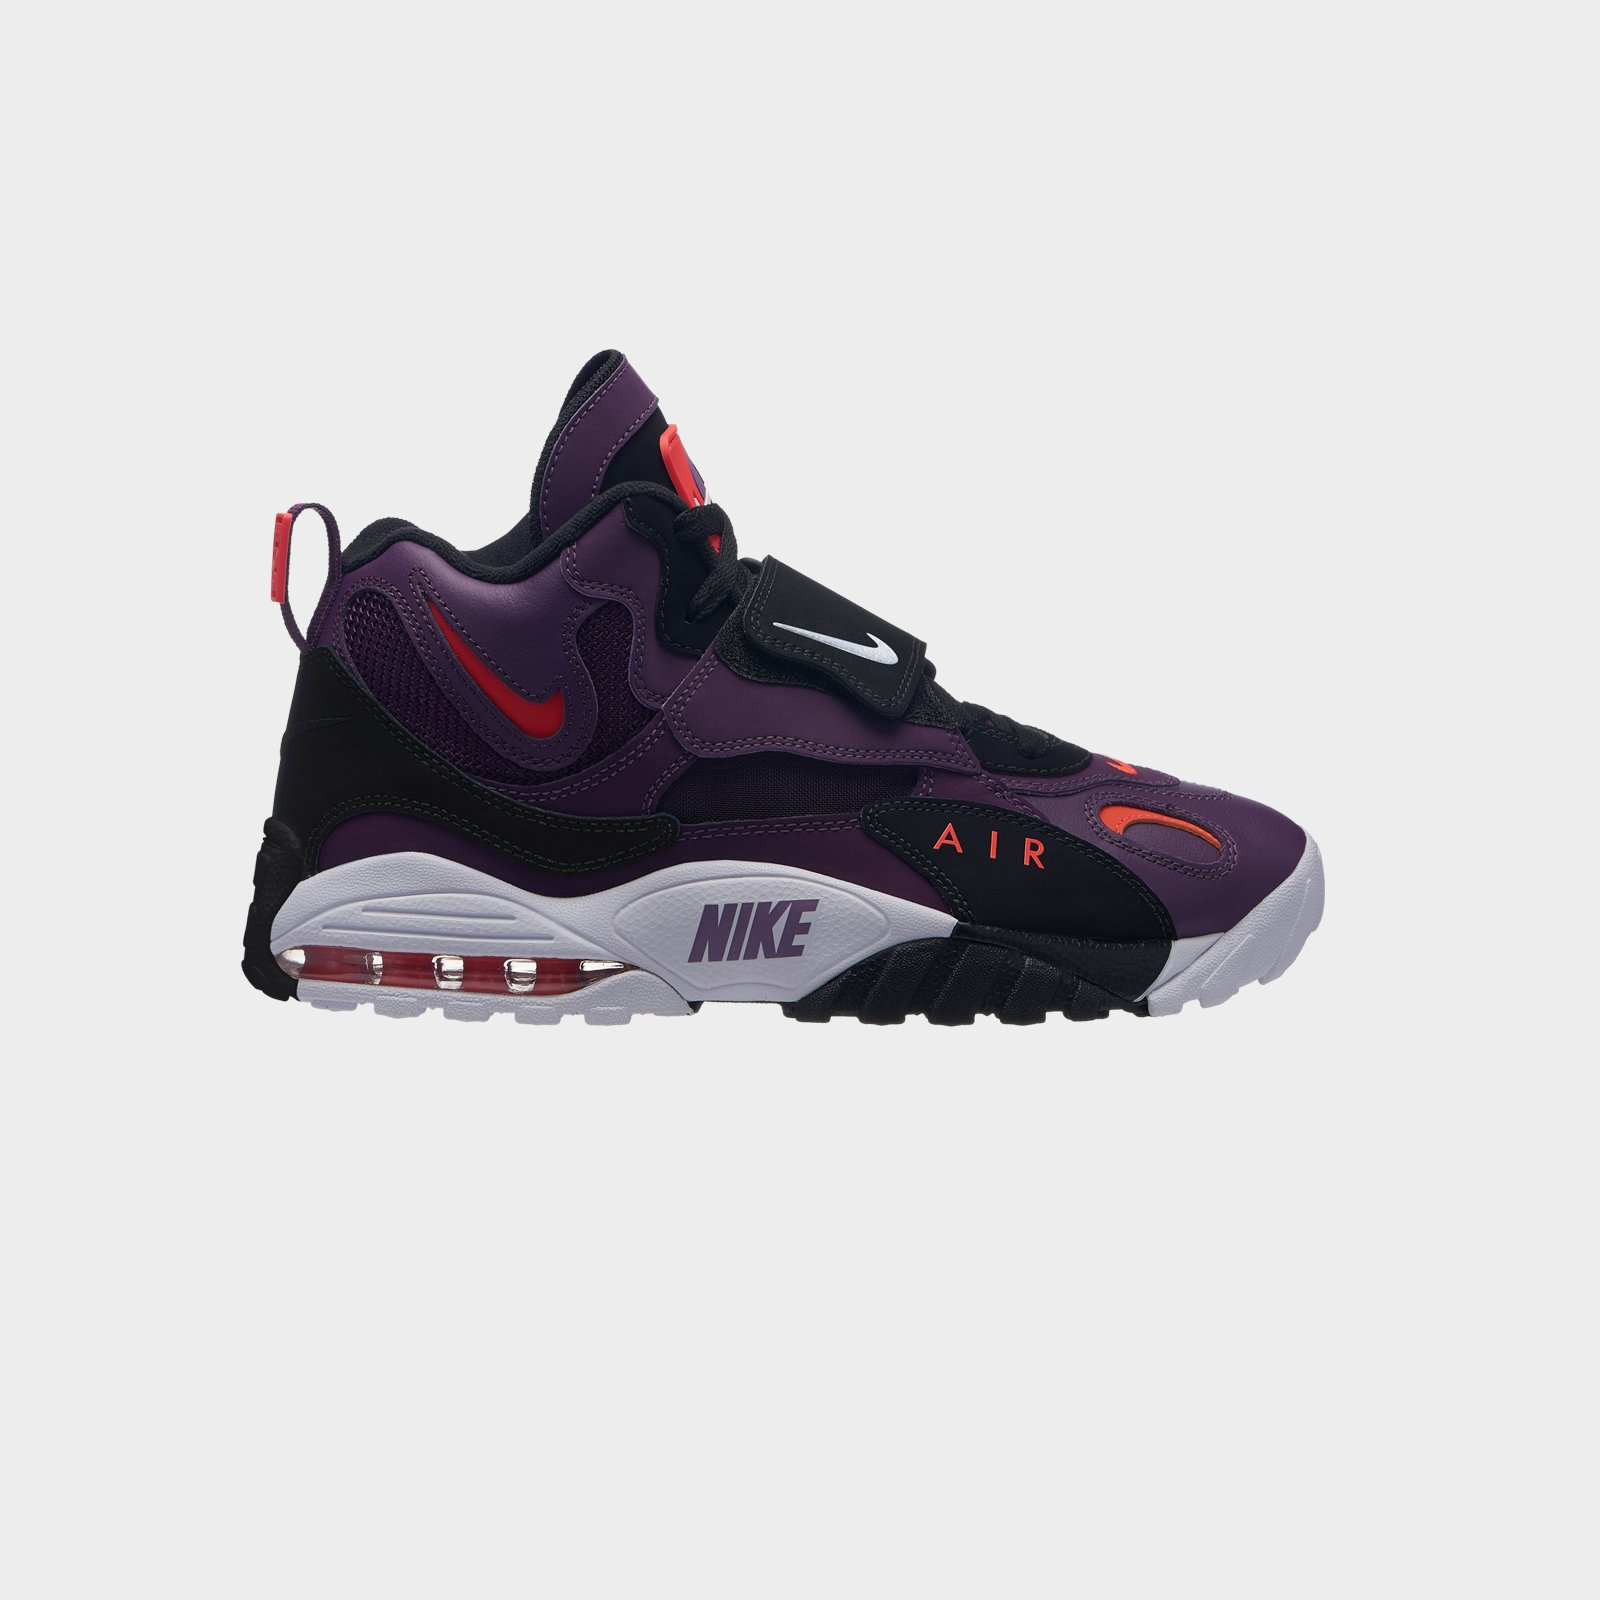 Nike Air Max Speed Turf - 525225-500